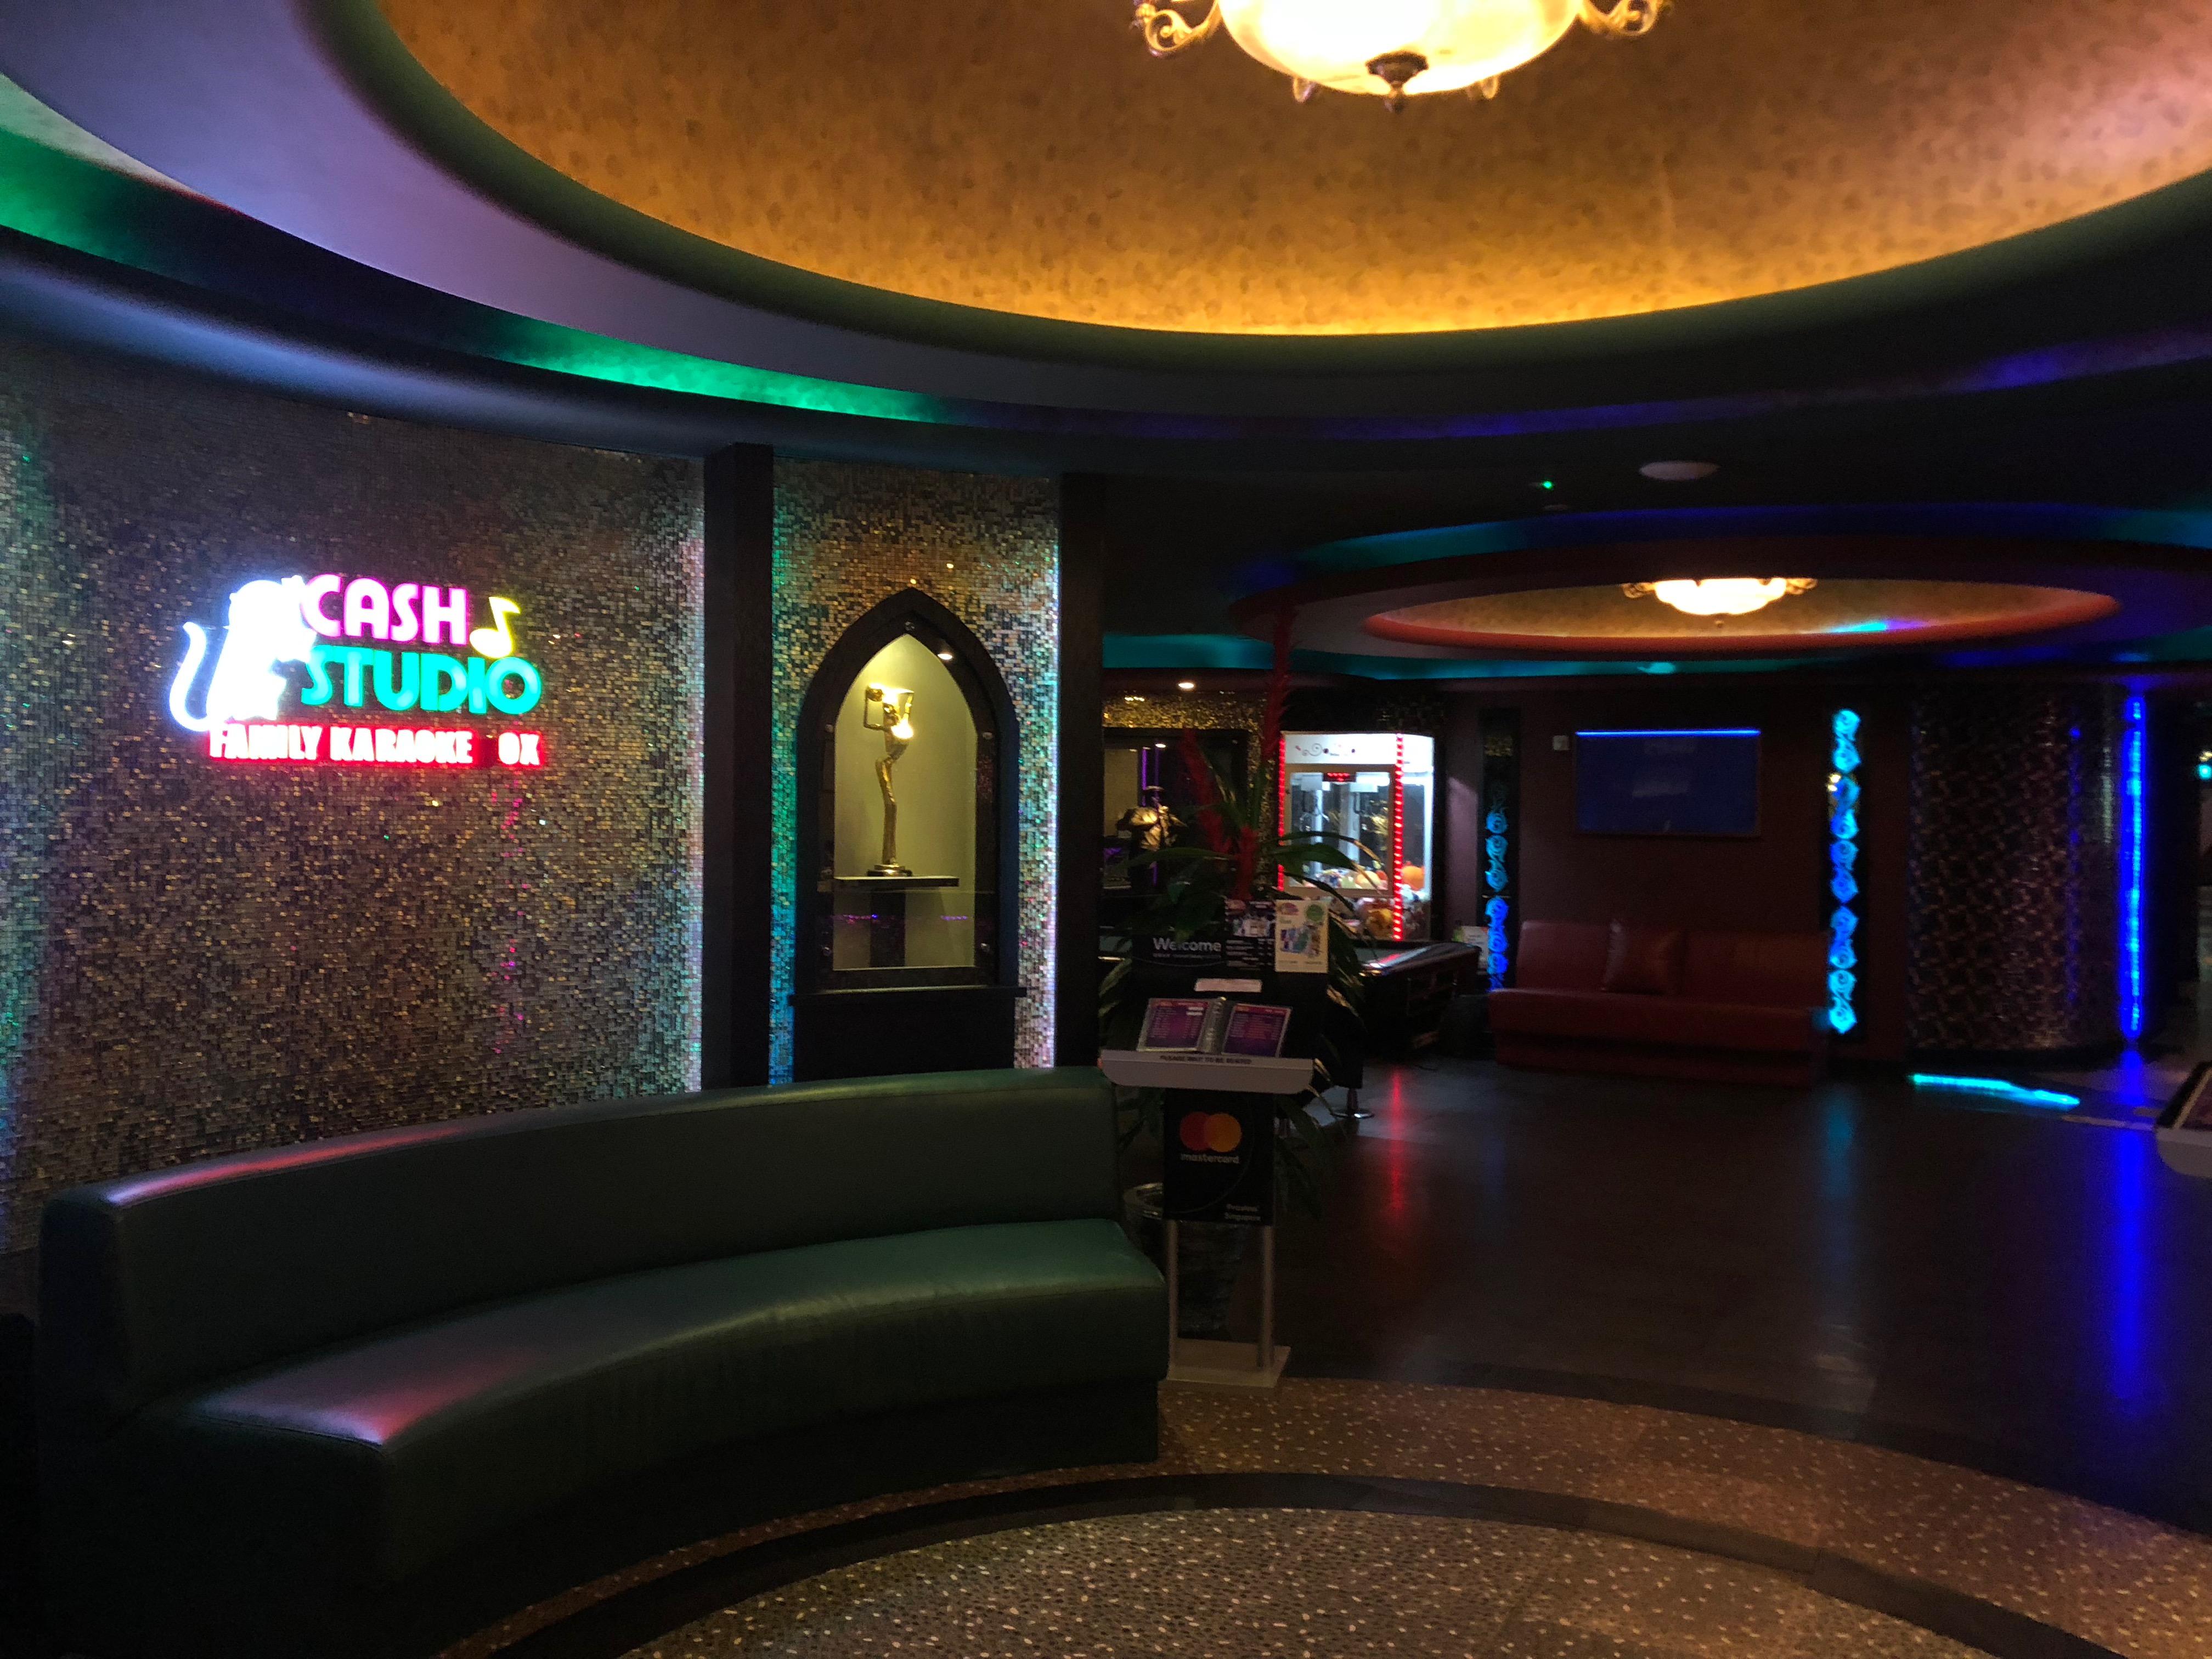 The interior of Cash Studio Family Karaoke.